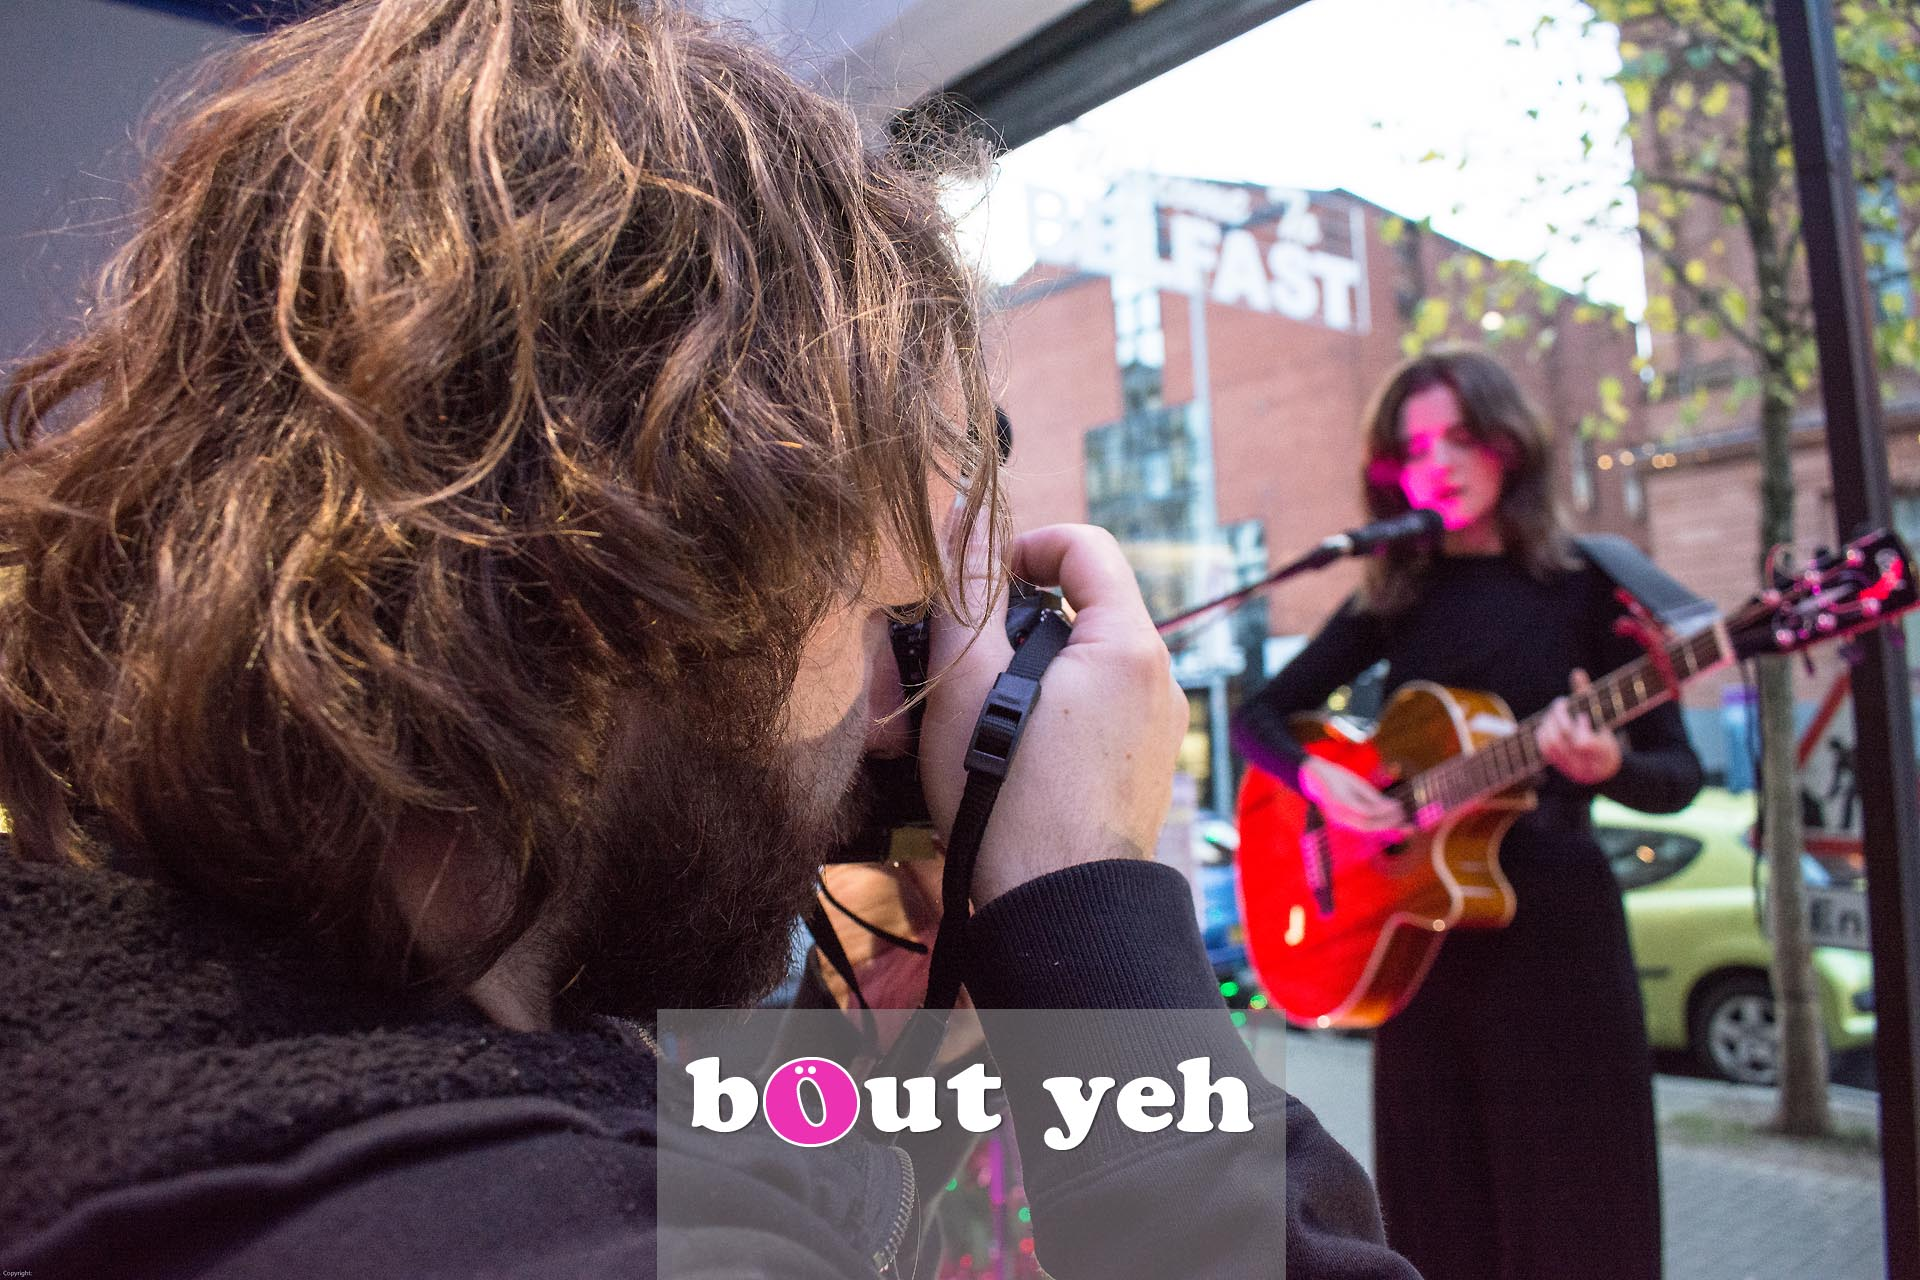 Rosie Carney singer concert at Dawsons Musical Instruments in Belfast - photo 2847.